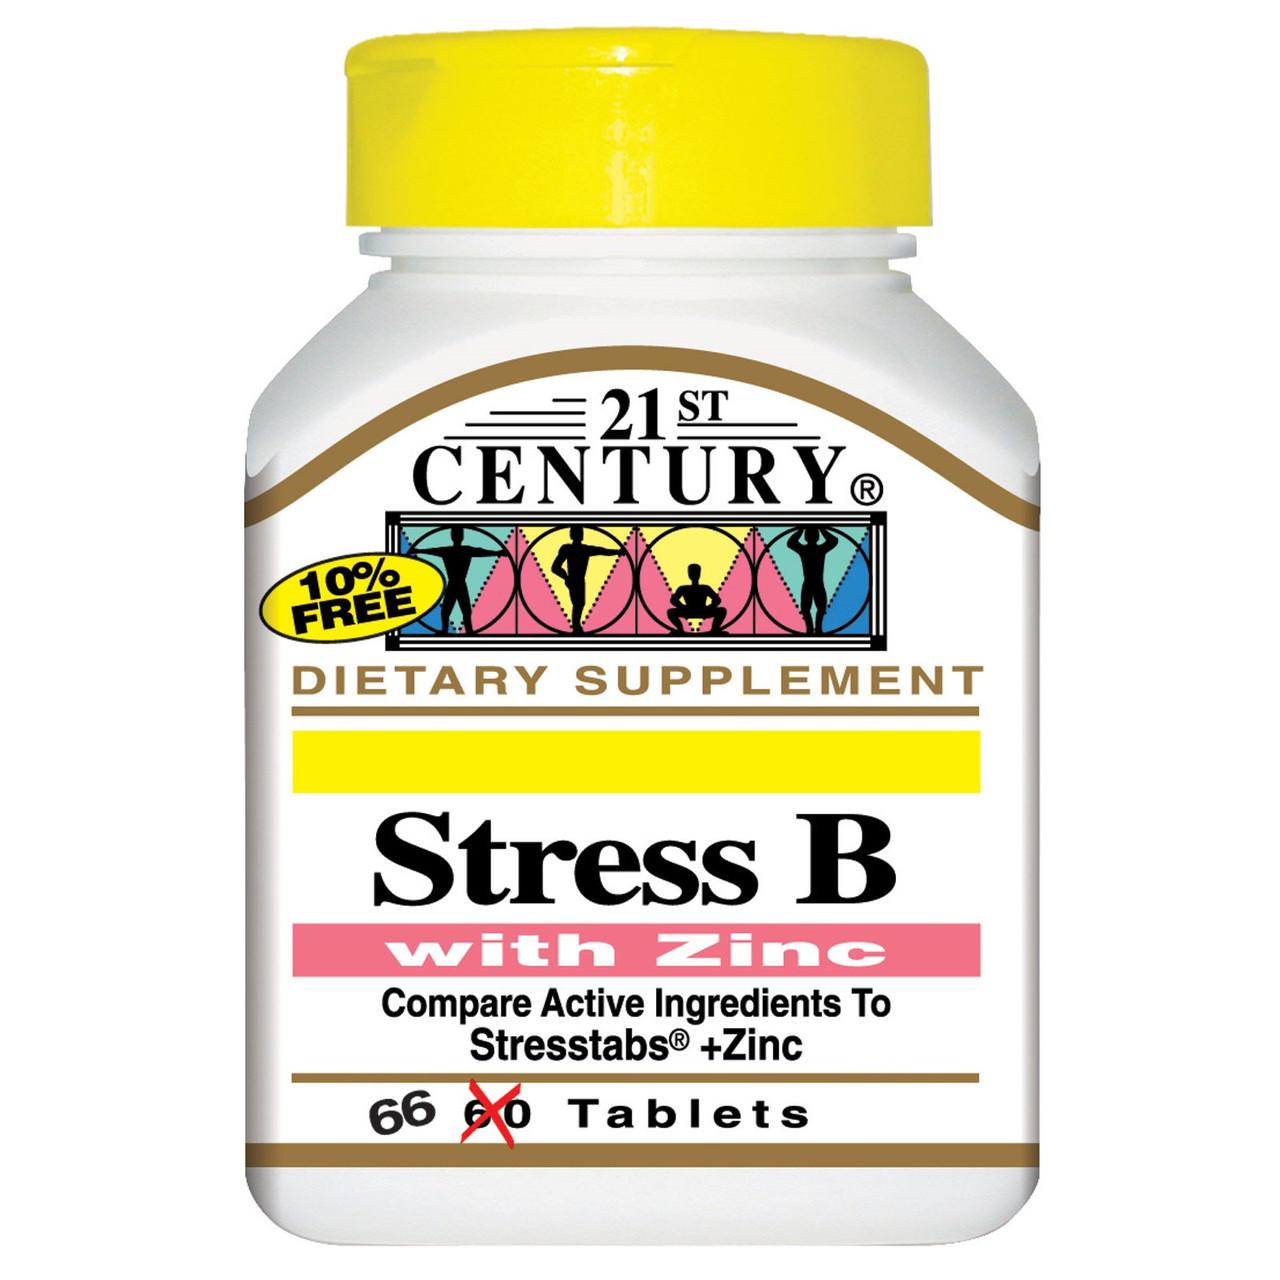 Комплекс витаминов группы В, Stress B, 21st Century, с цинком, 66 таблеток